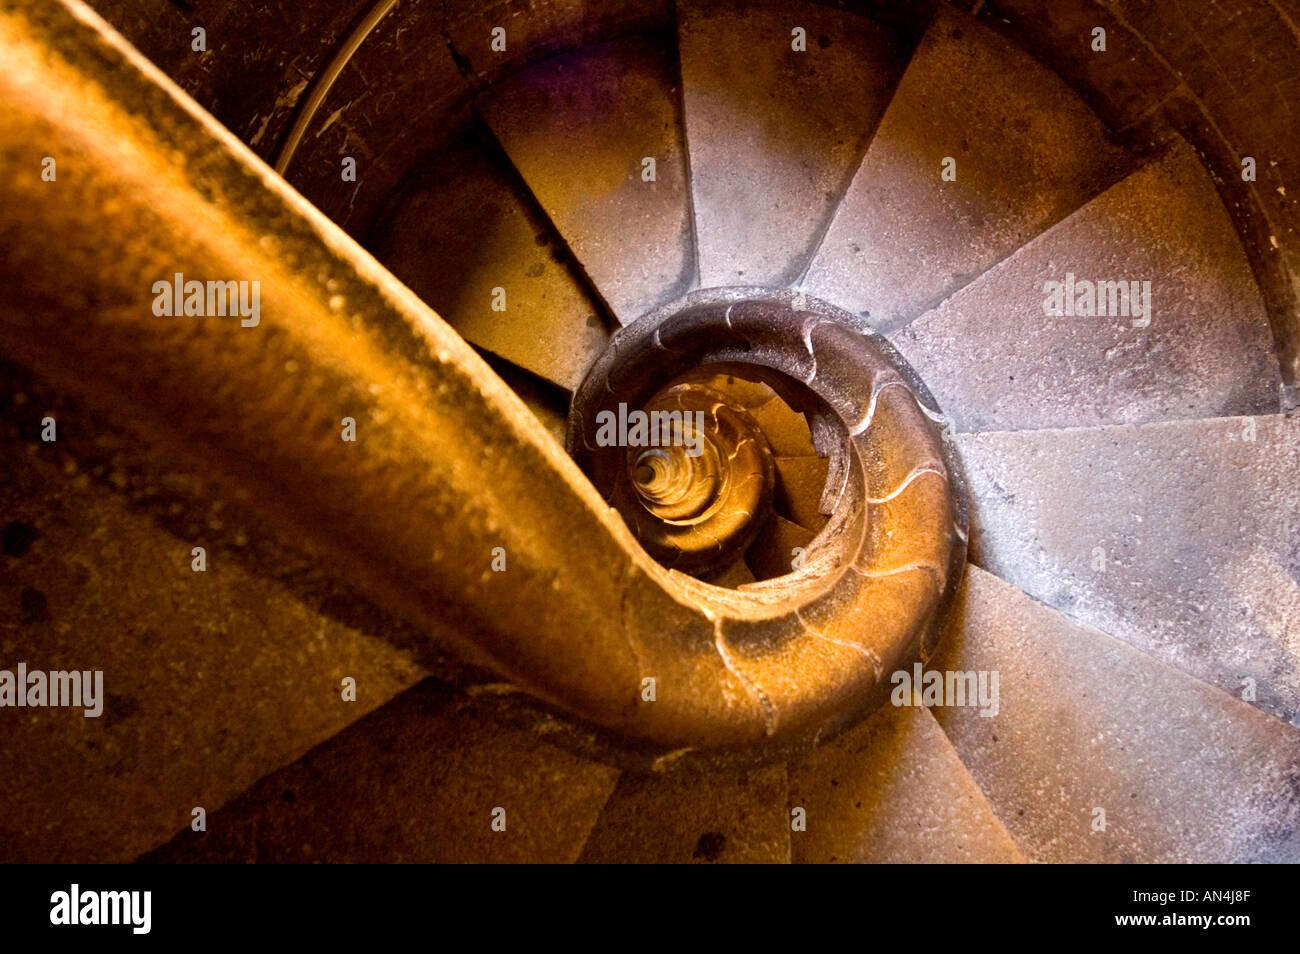 Spiral staircase in Sagrada Família church designed by modernista architect Antoni Gaudí Barcelona Spain - Stock Image